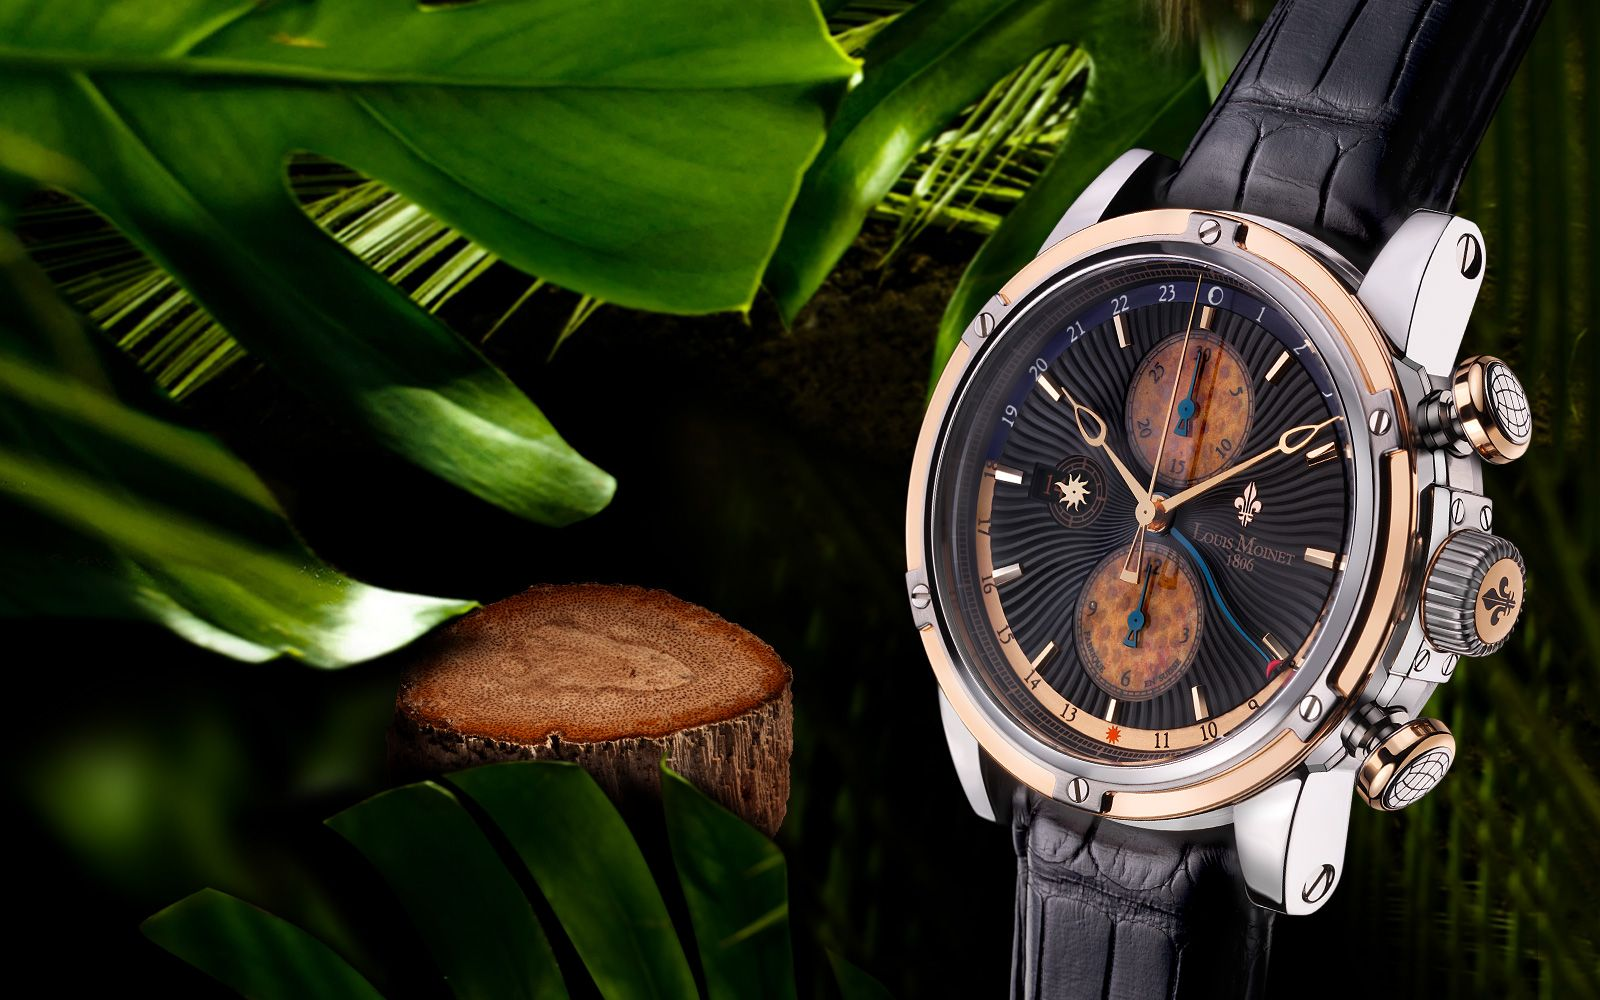 Louis Moinet - Geograph Rainforest - Limited Editions - 18K Rose Gold: reddot design award best of best 2012